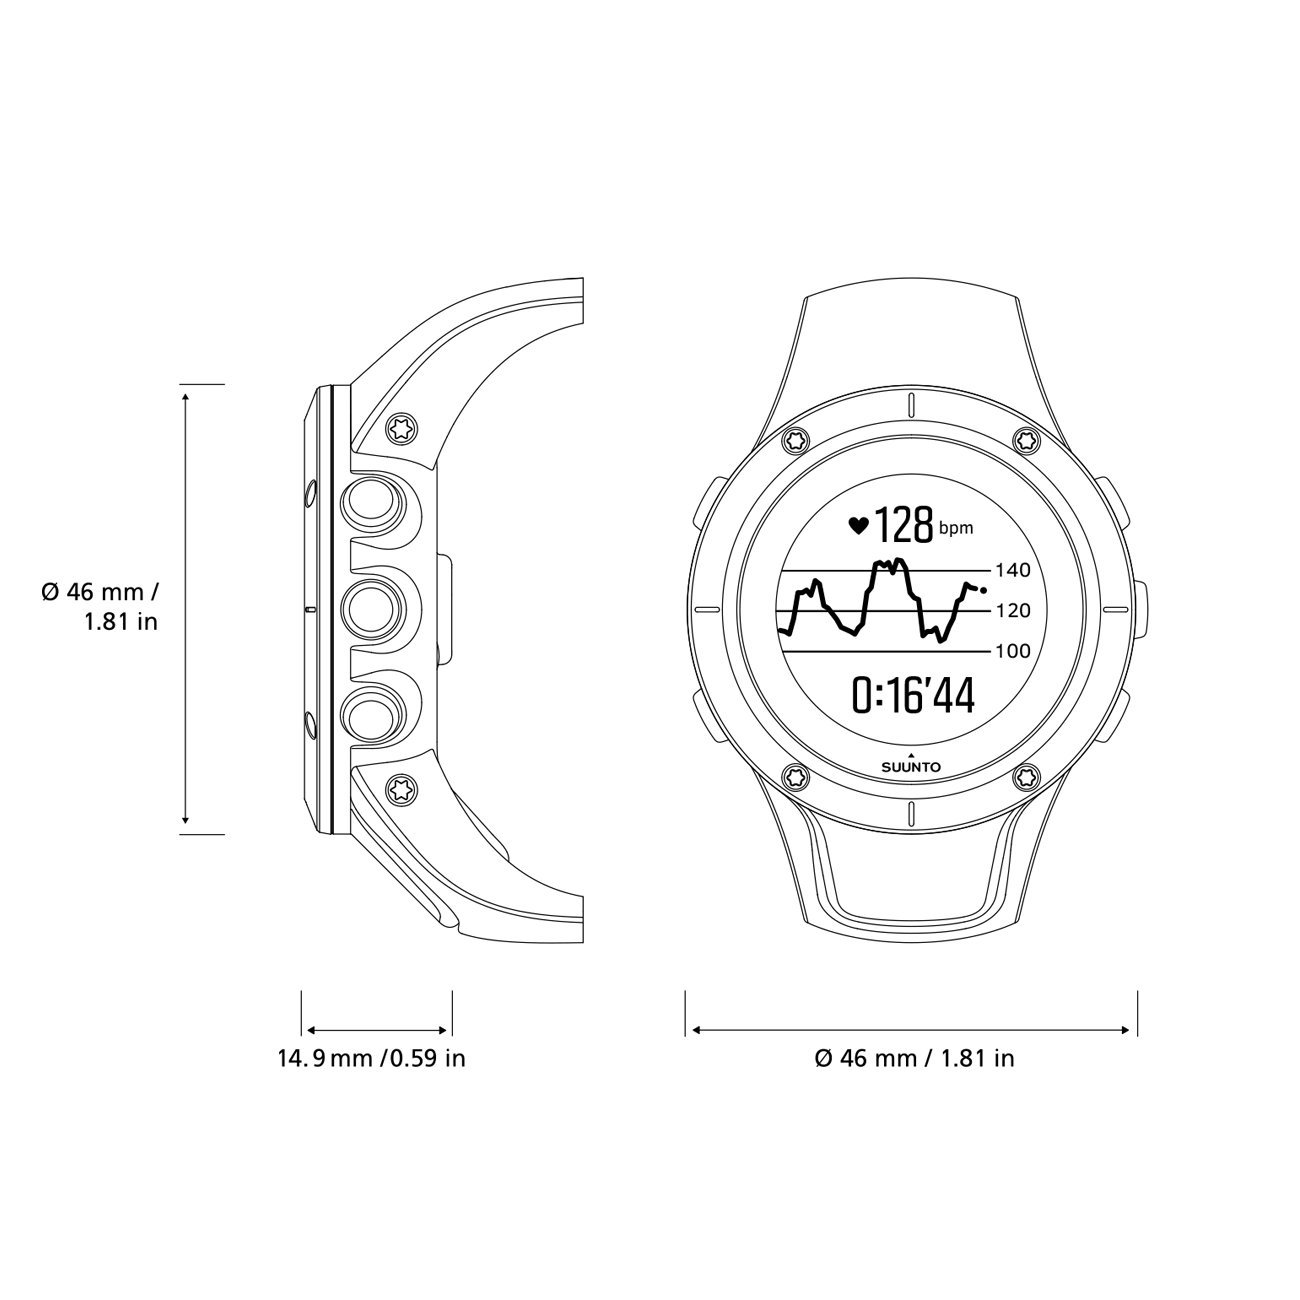 Suunto Spartan Trainer Wrist HR Multisport GPS Watch (Gold) by Suunto (Image #7)